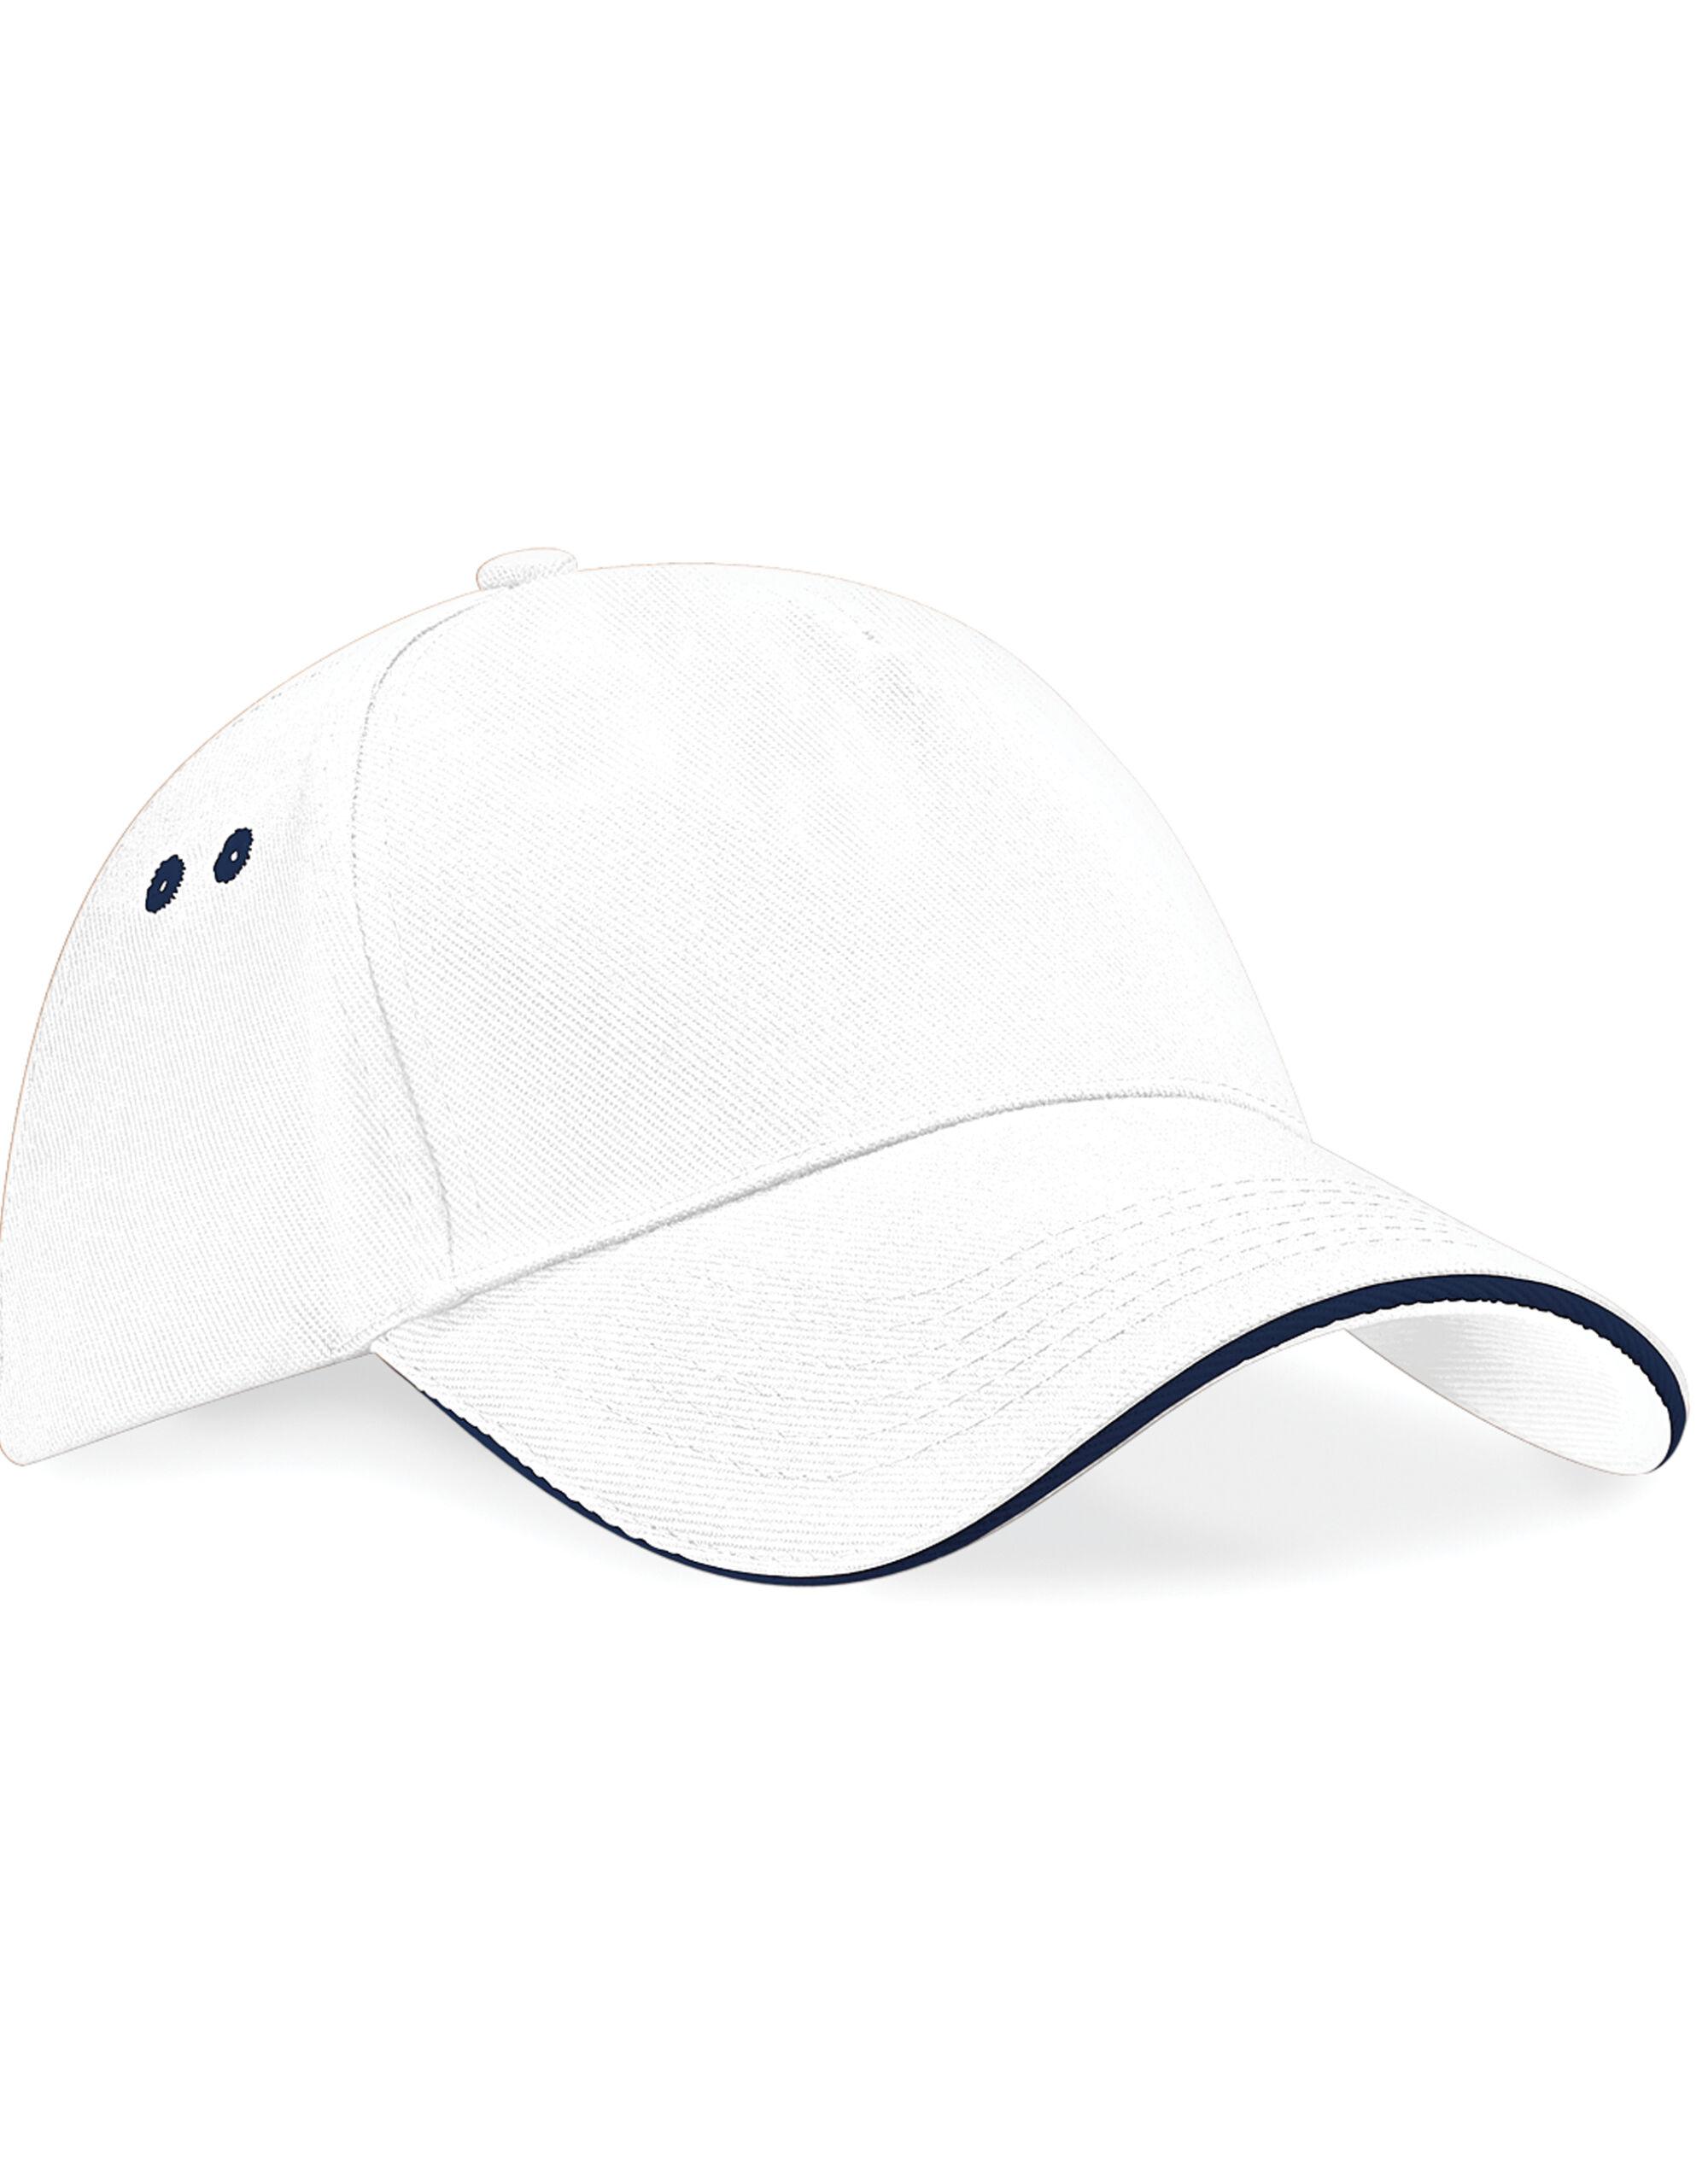 a5965baefe6 Beechfield Ultimte Sandwich Peak Cap Caps   Hats Etc All Sizes and ...